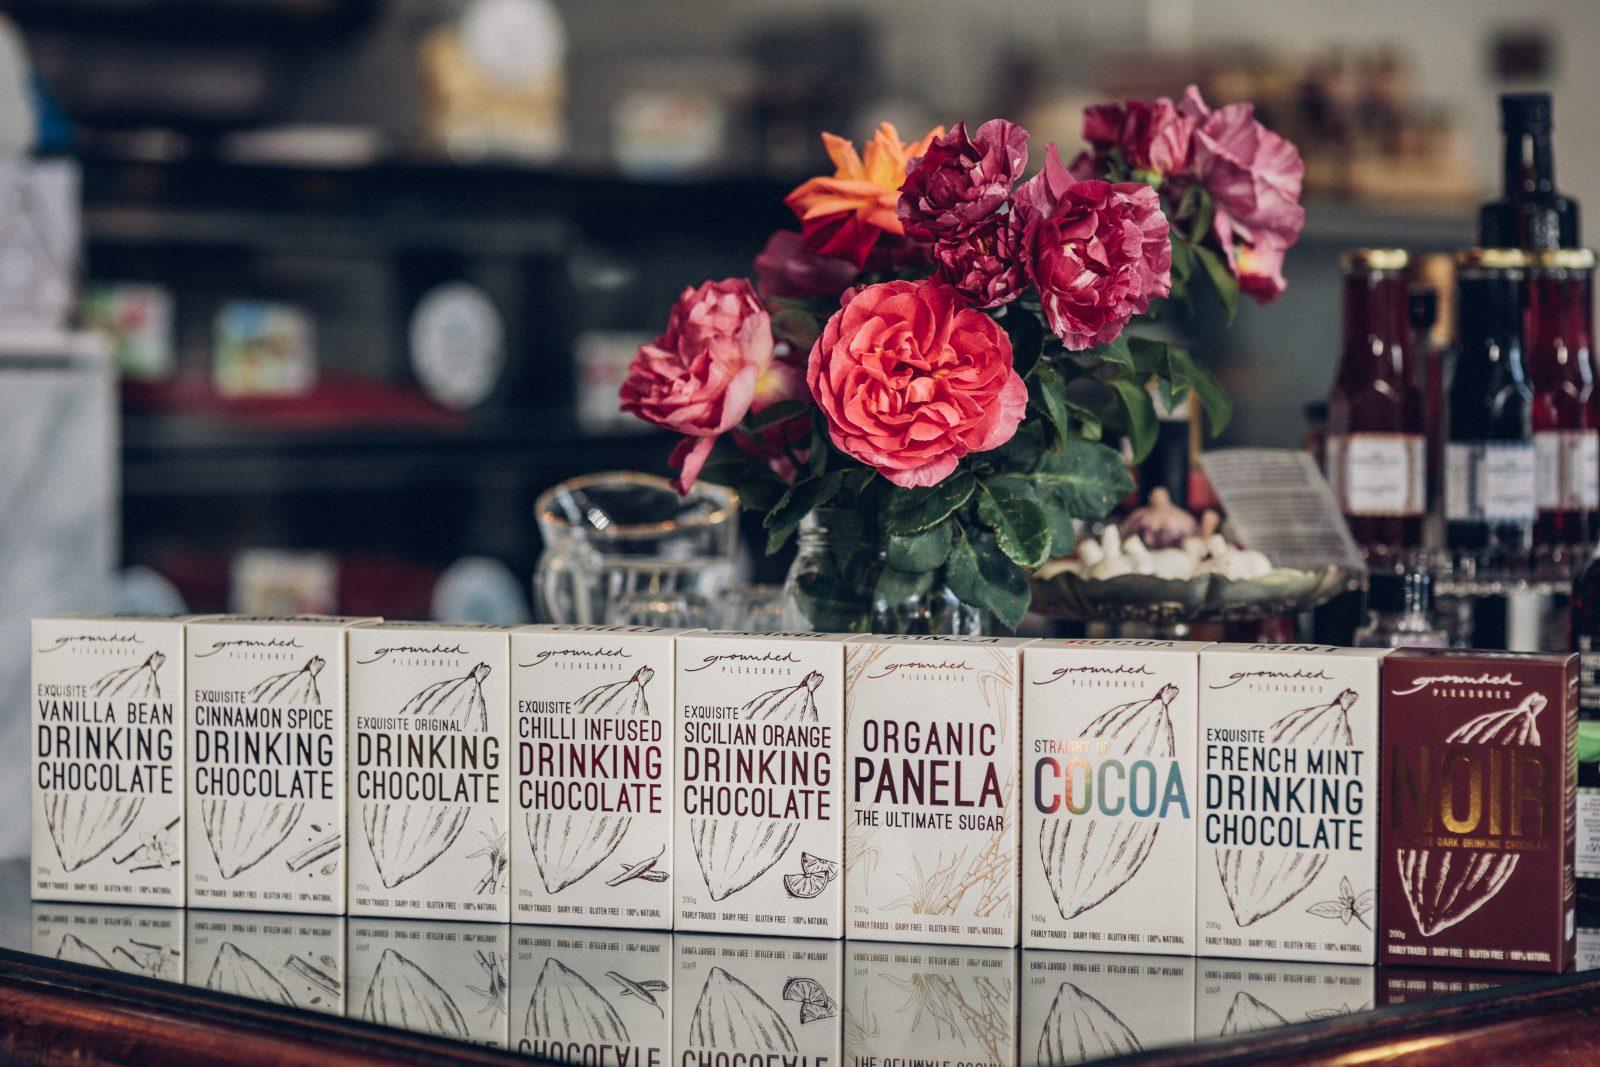 Grounded Pleasures range of exquisite drinking chocolates